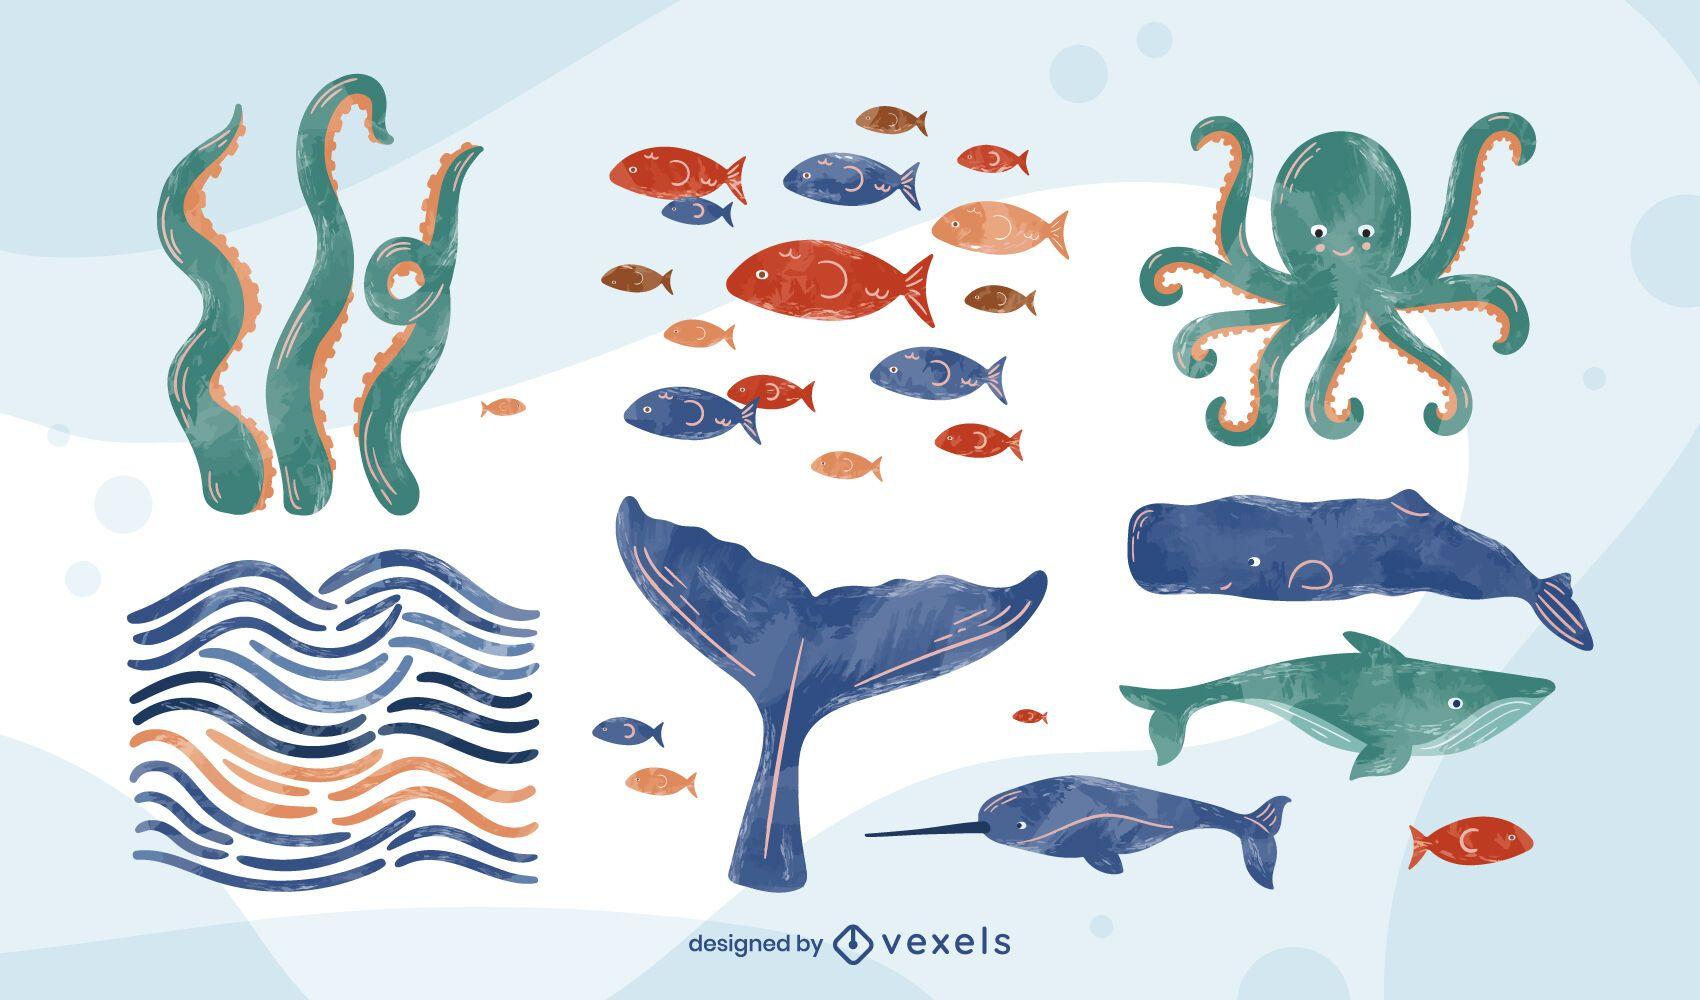 Acuarela de vida marina